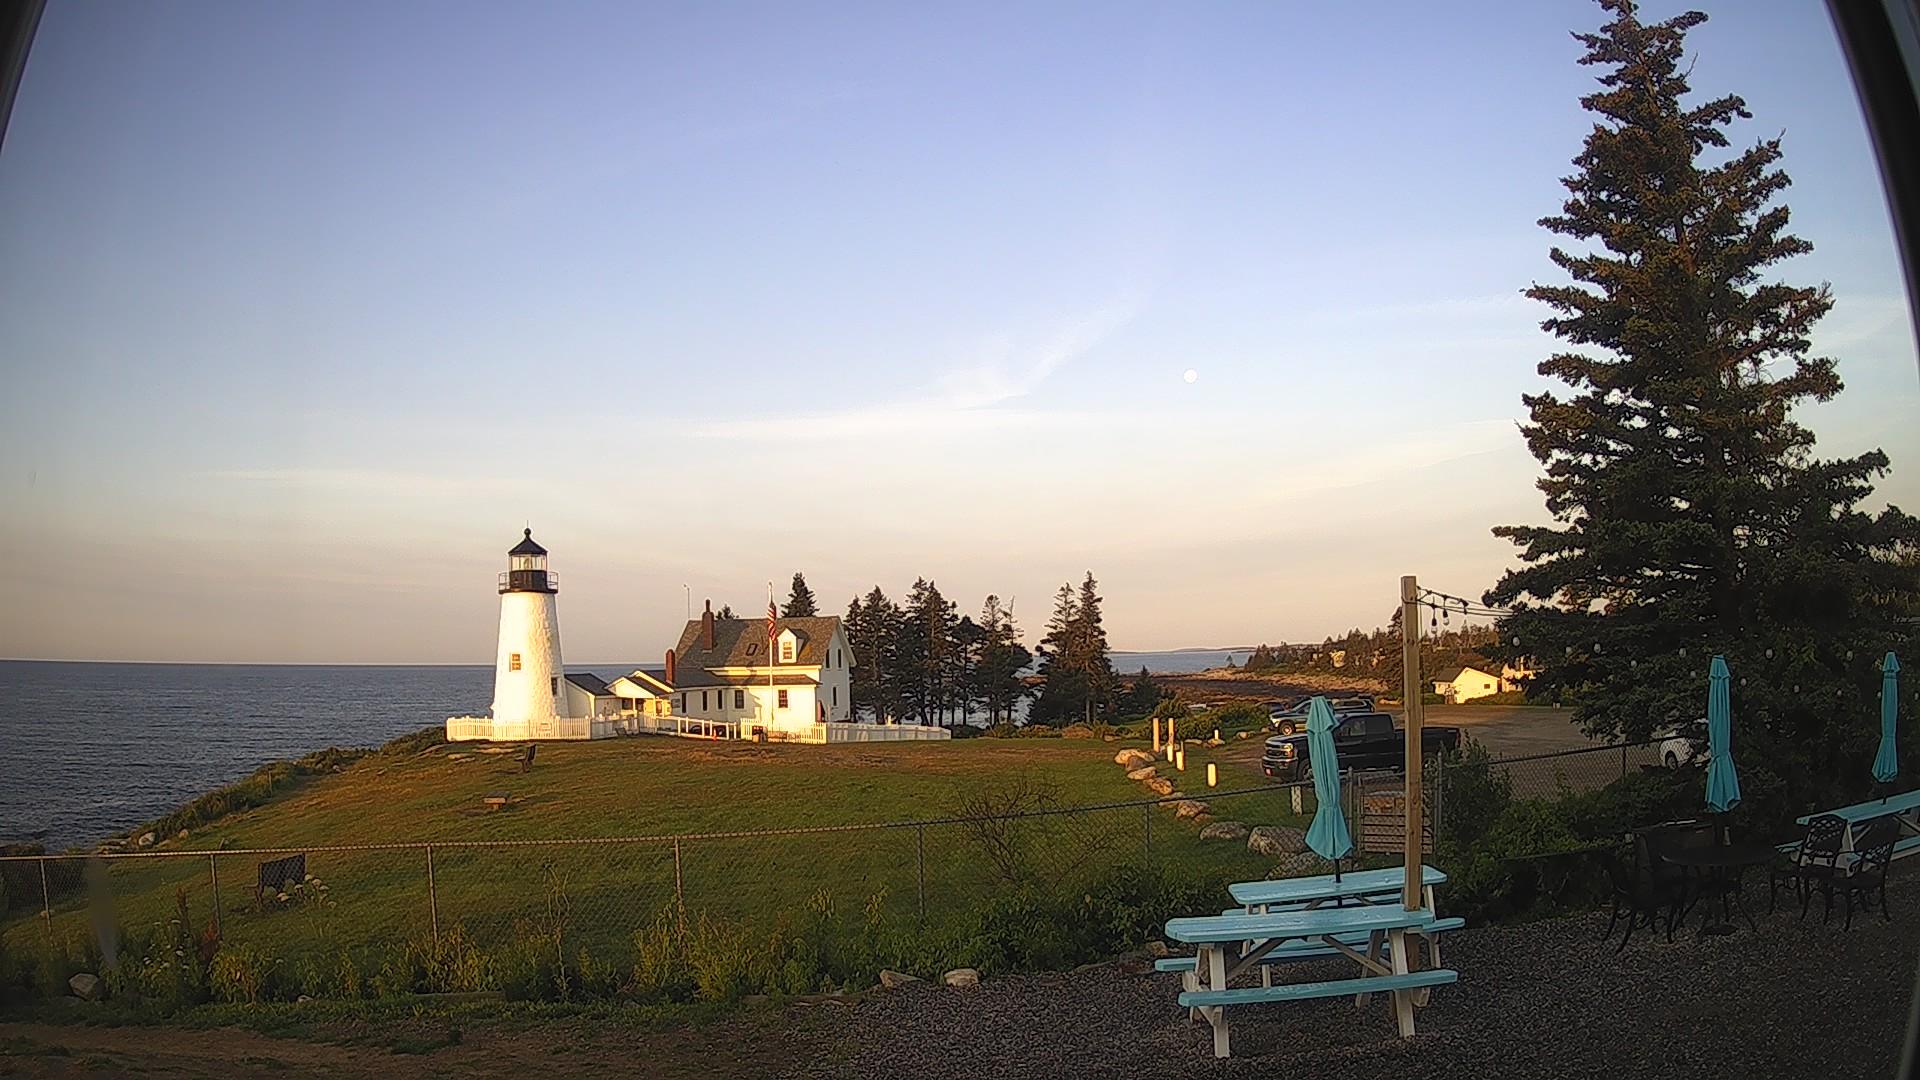 Damariscotta webcam - Pemaquid Point Lighthouse webcam, Maine, Lincoln County